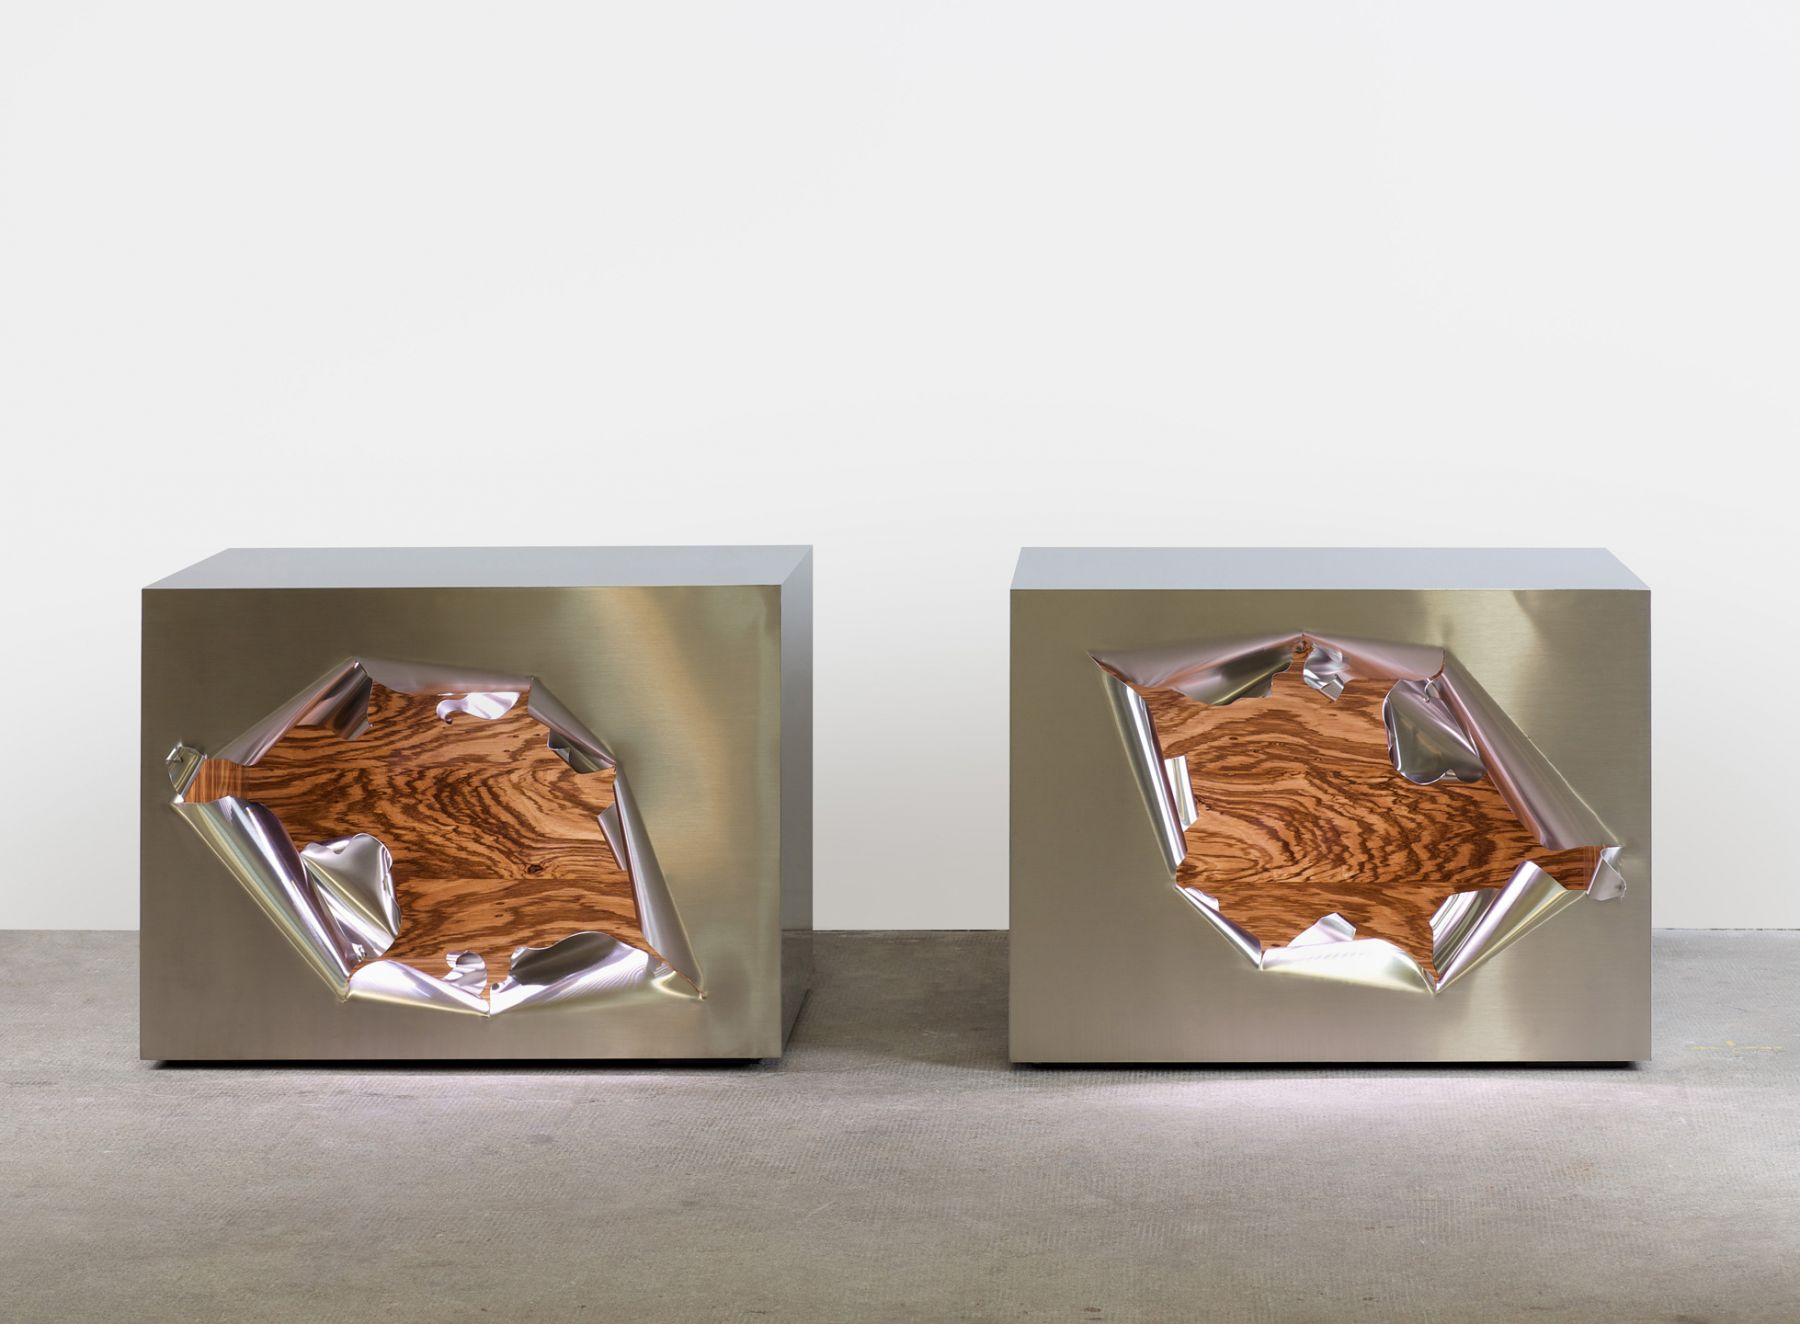 Maria Pergay | Cube Casse / Broken Cube A and B, 2010